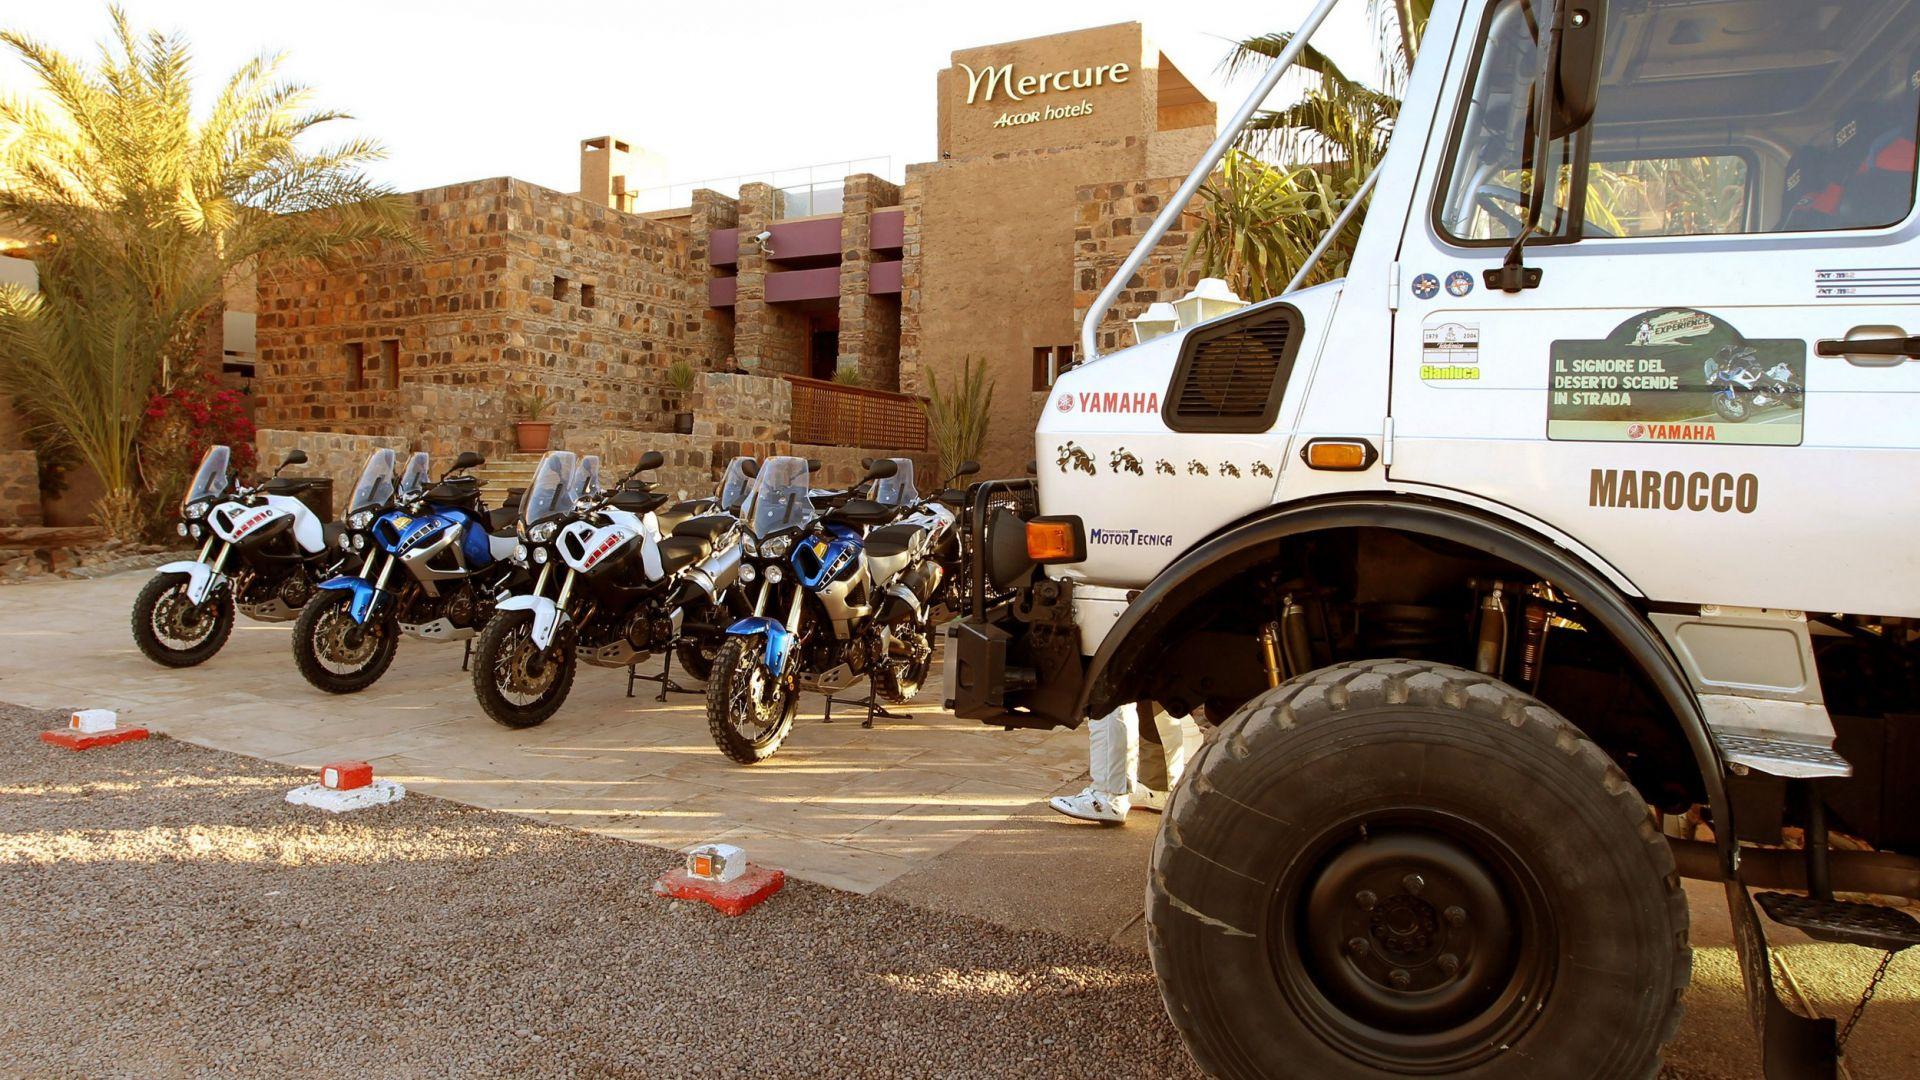 Immagine 33: In Marocco con la Yamaha Super Ténéré